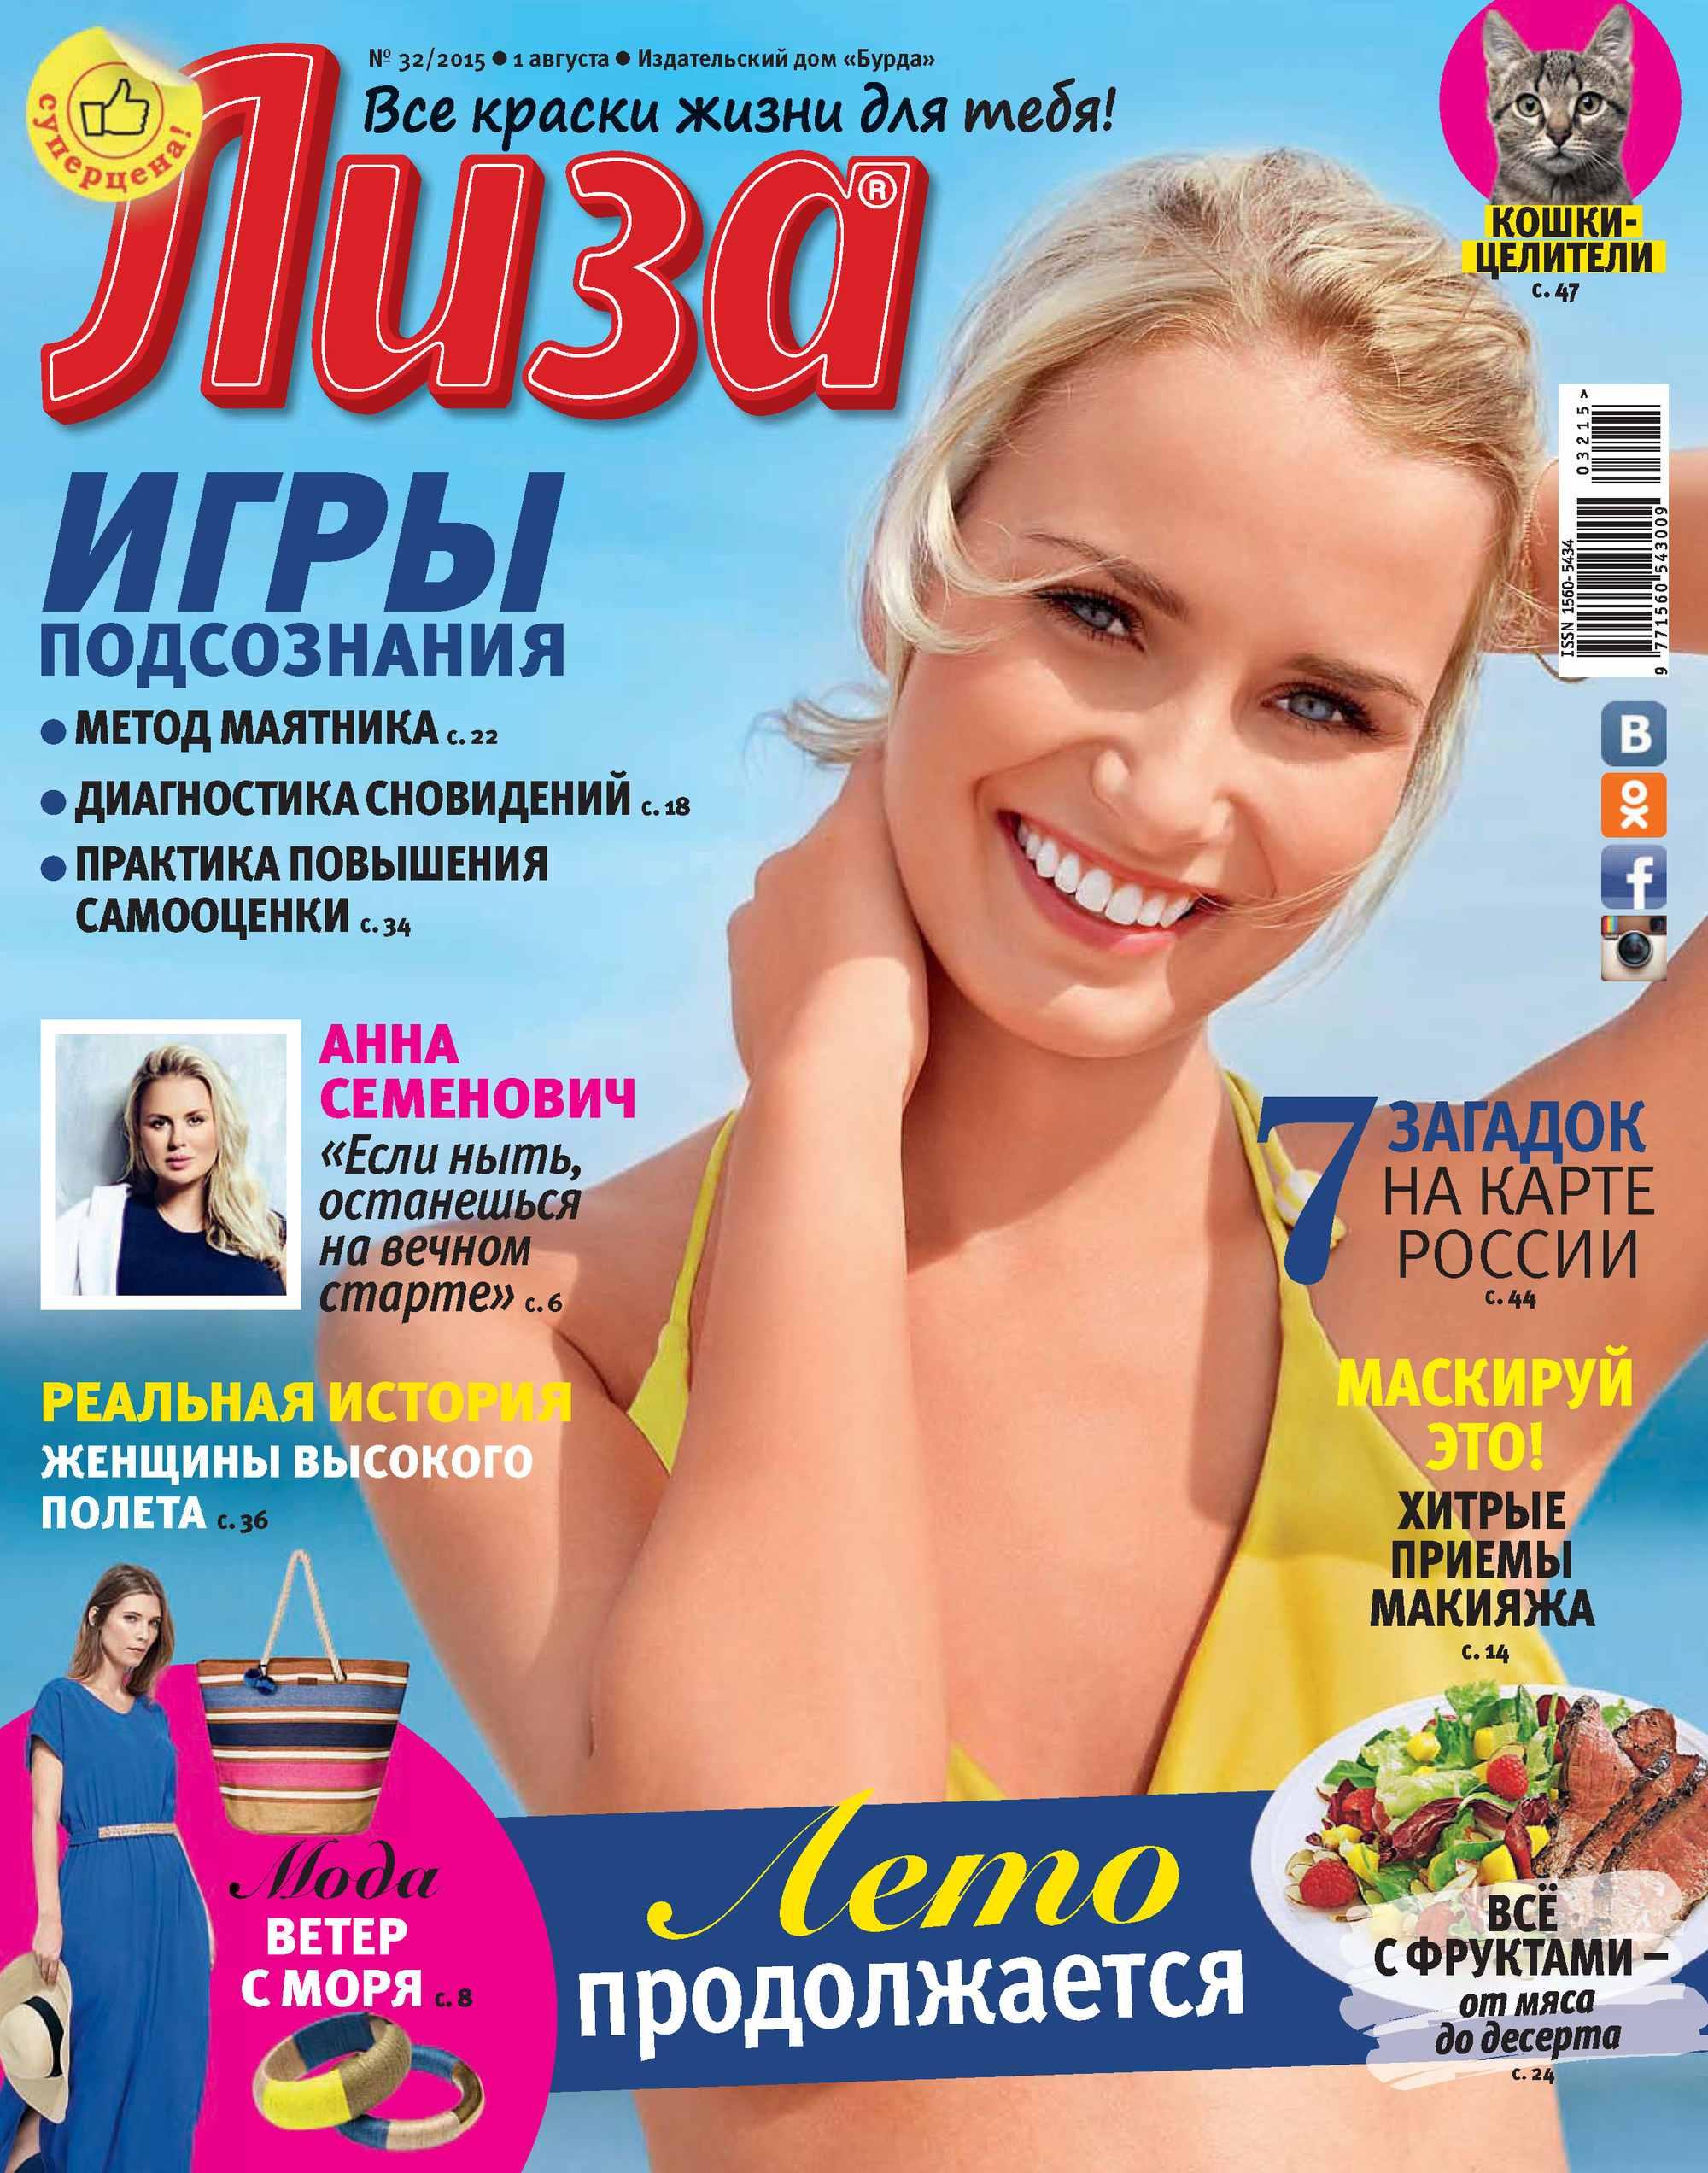 ИД «Бурда» Журнал «Лиза» №32/2015 ид бурда журнал лиза 22 2015